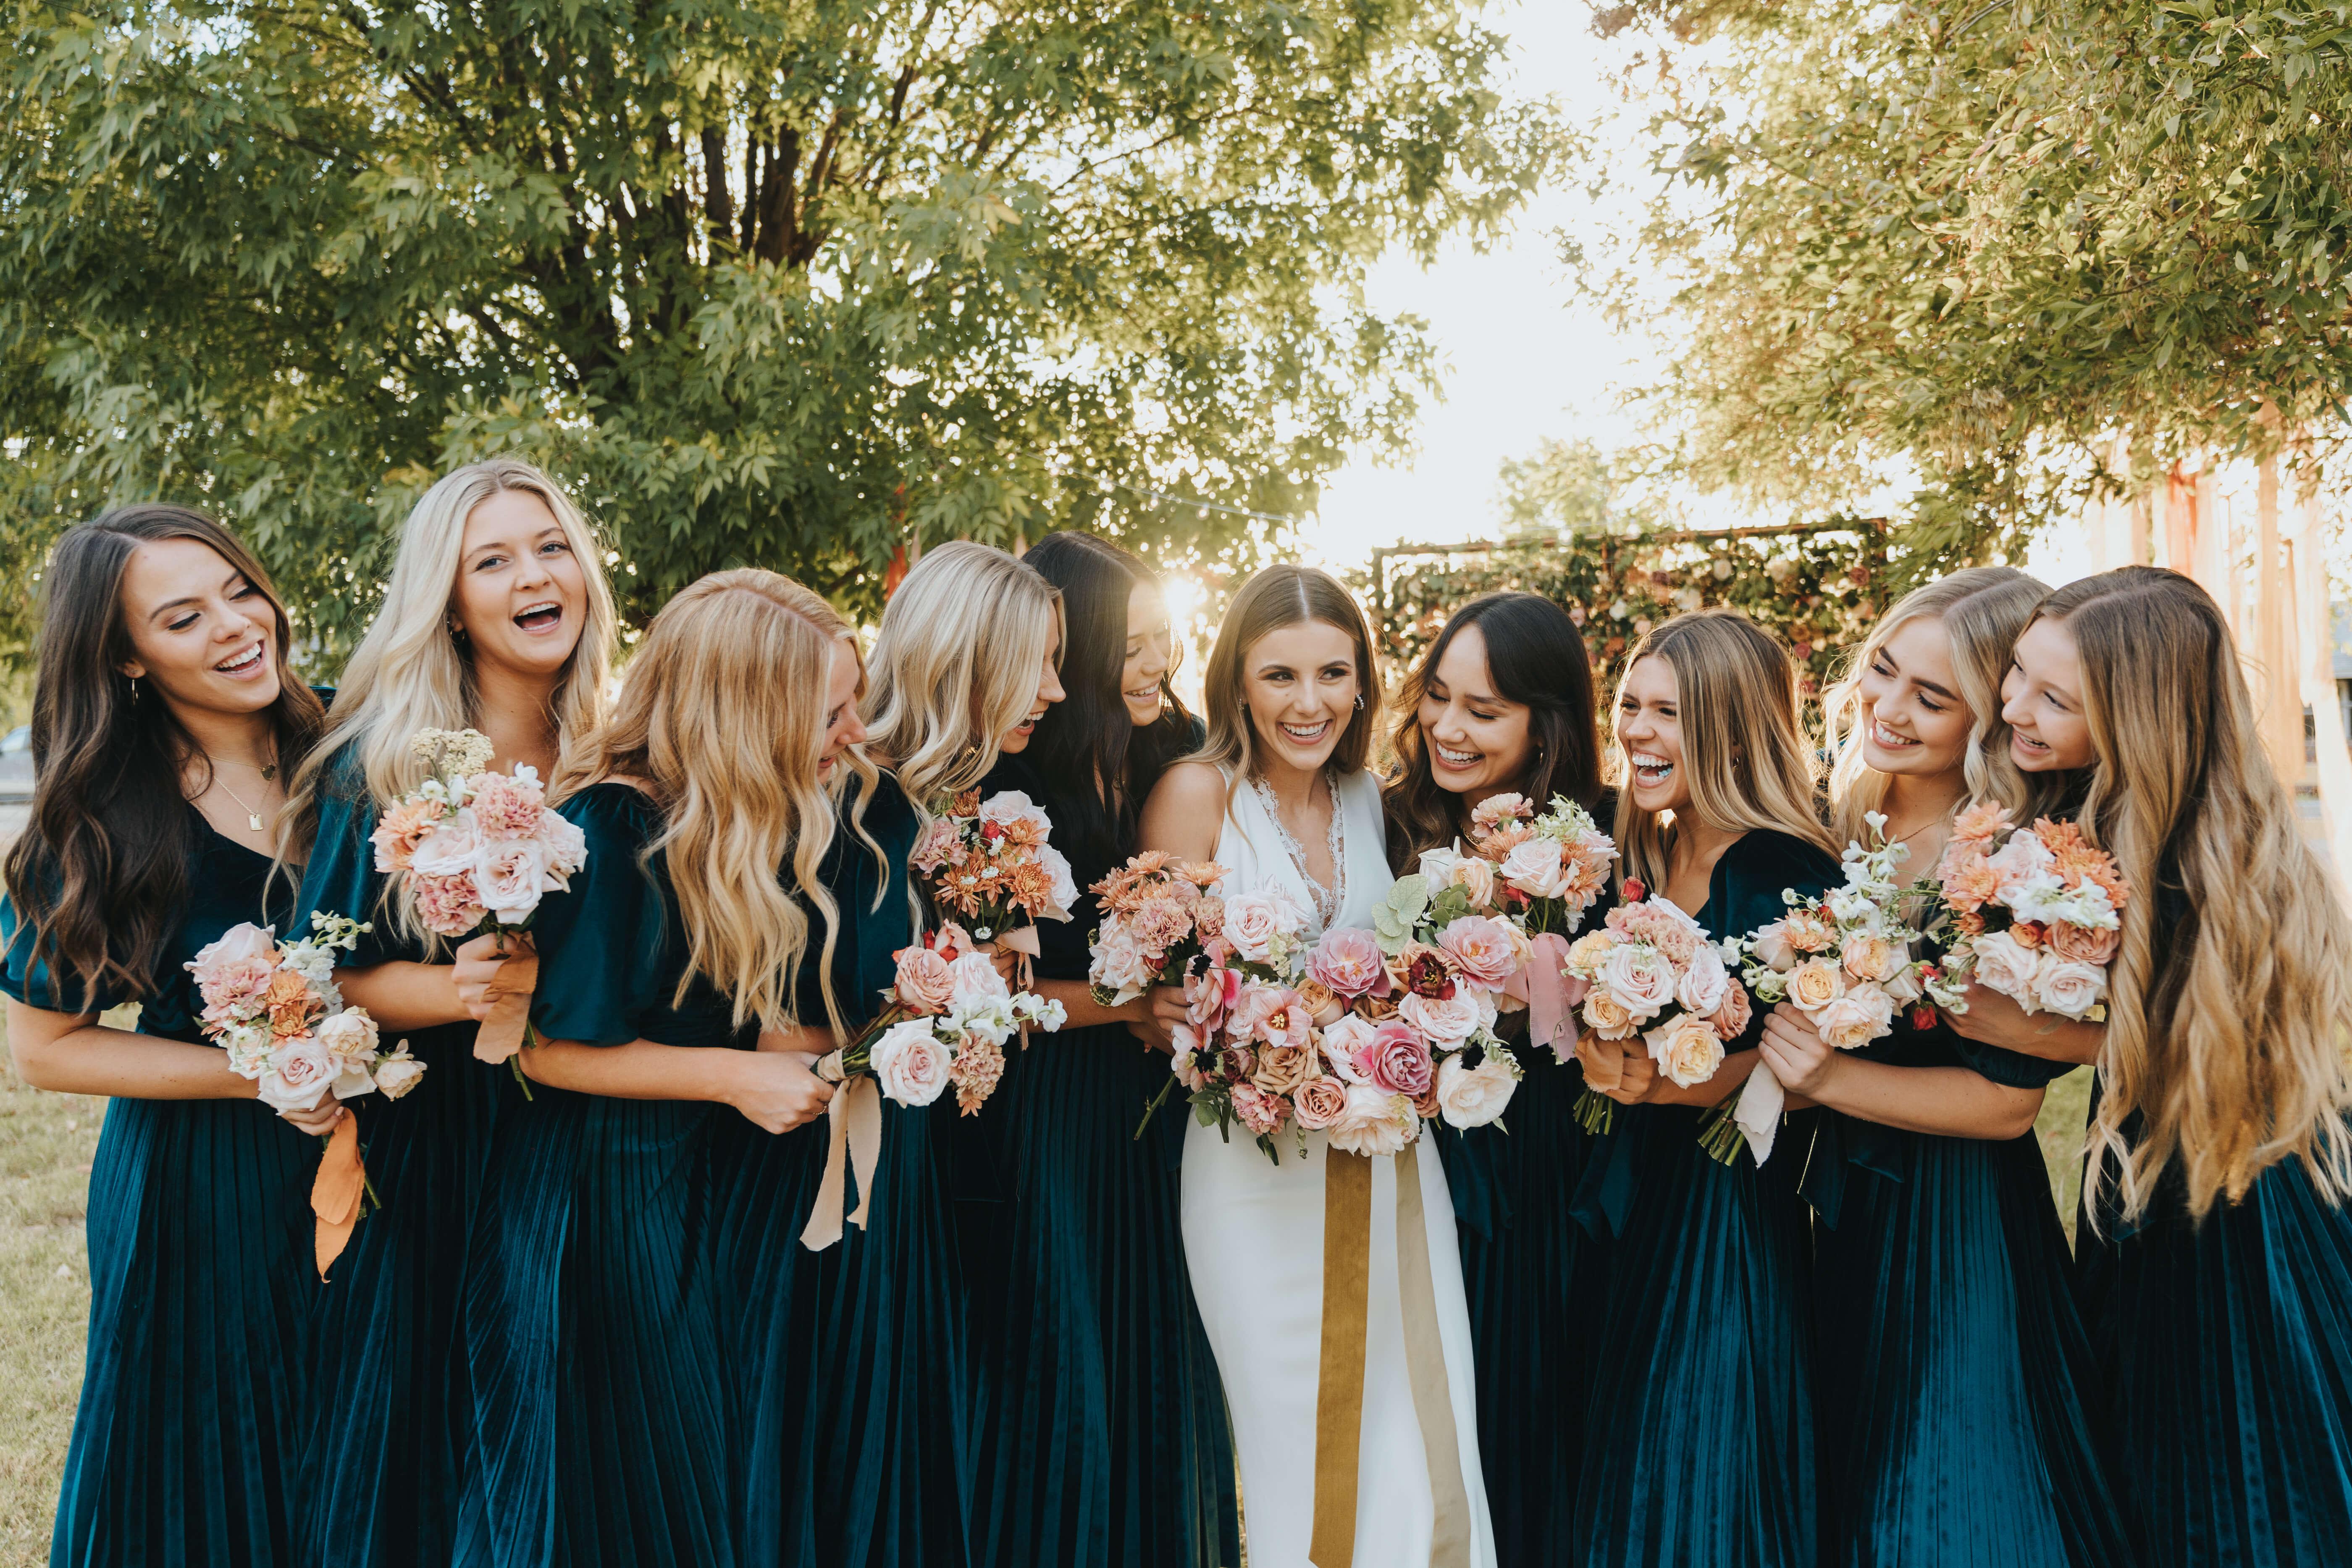 bridesmaid emerald green wedding dresses